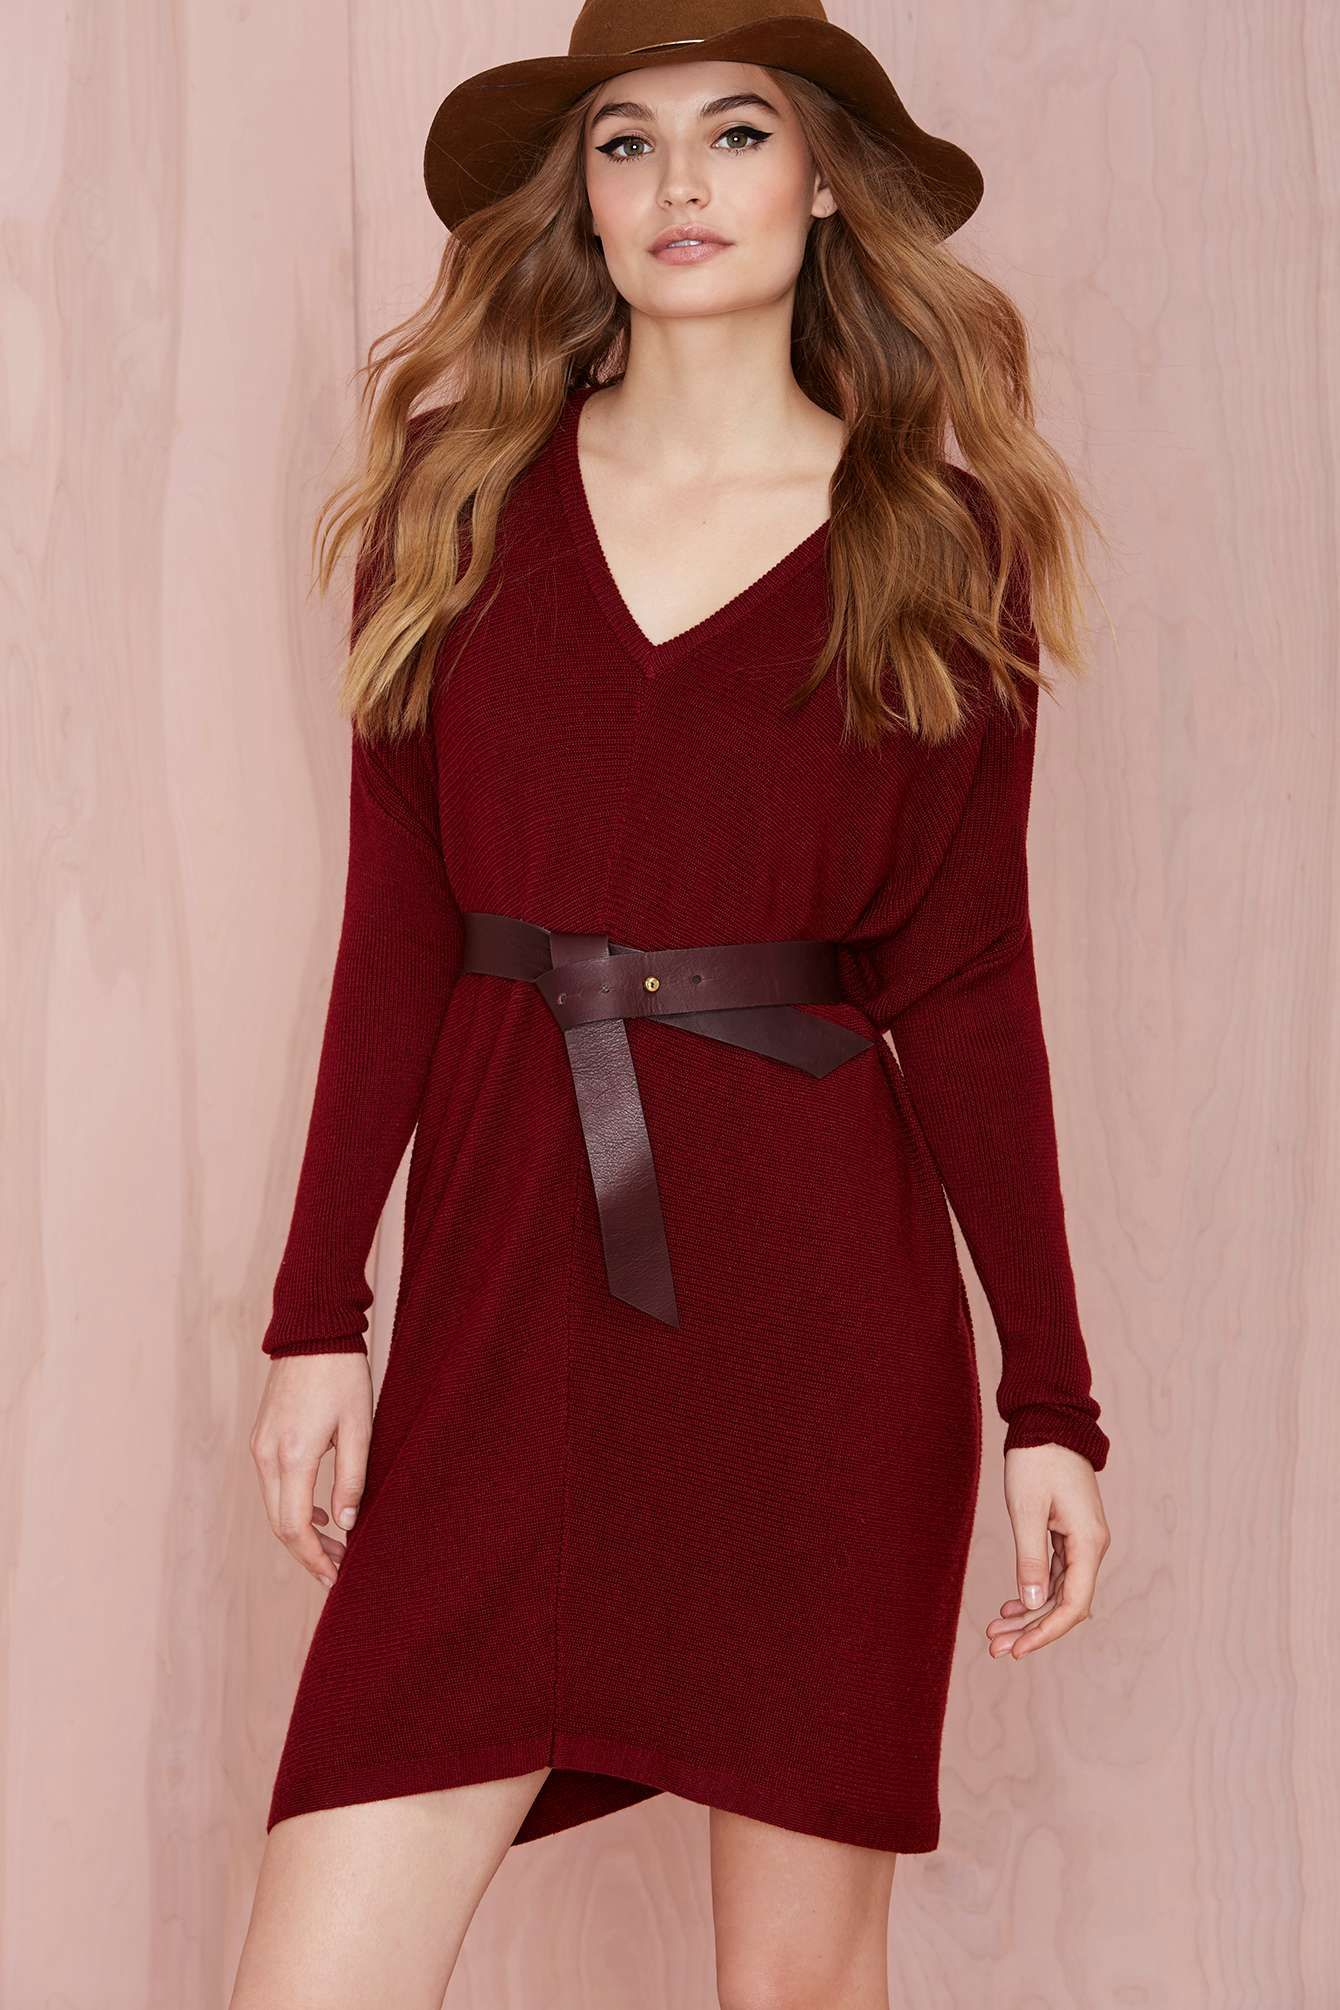 Gabriella Knit Tunic - Burgundy Dress | Dress | Pinterest | Tunics ...